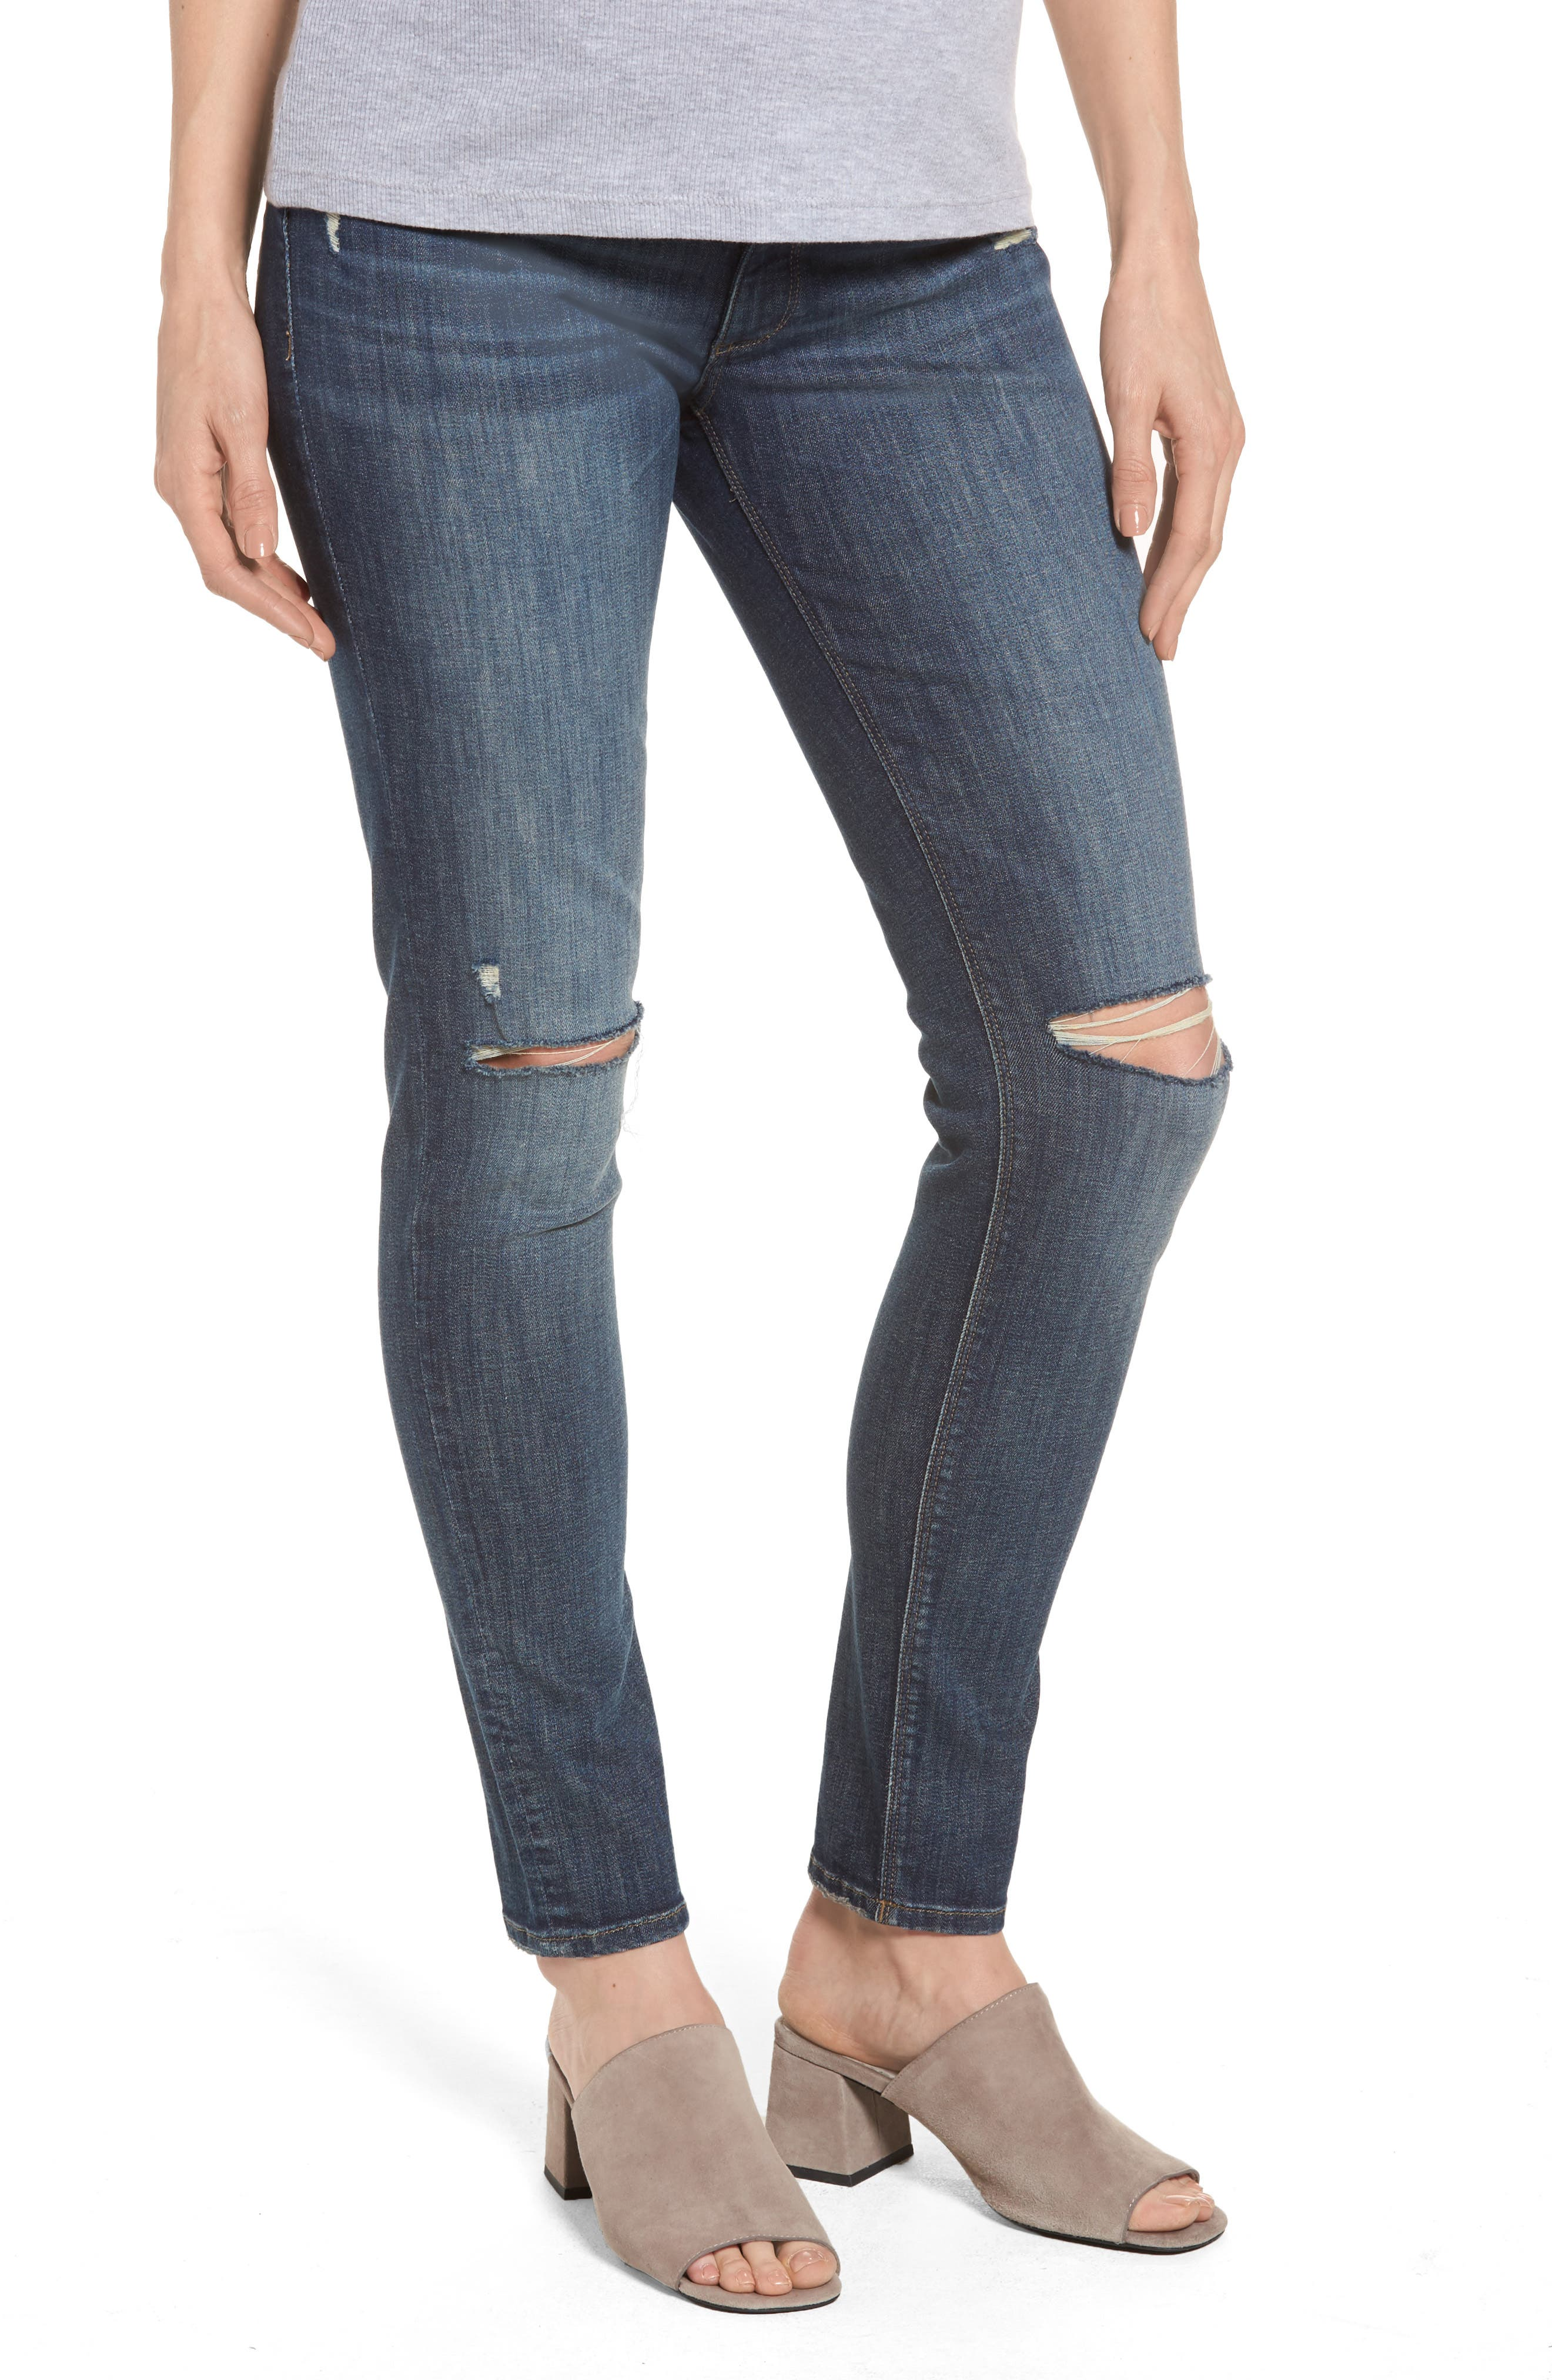 DL1961 Emma Power Legging Maternity Jeans (Heath)